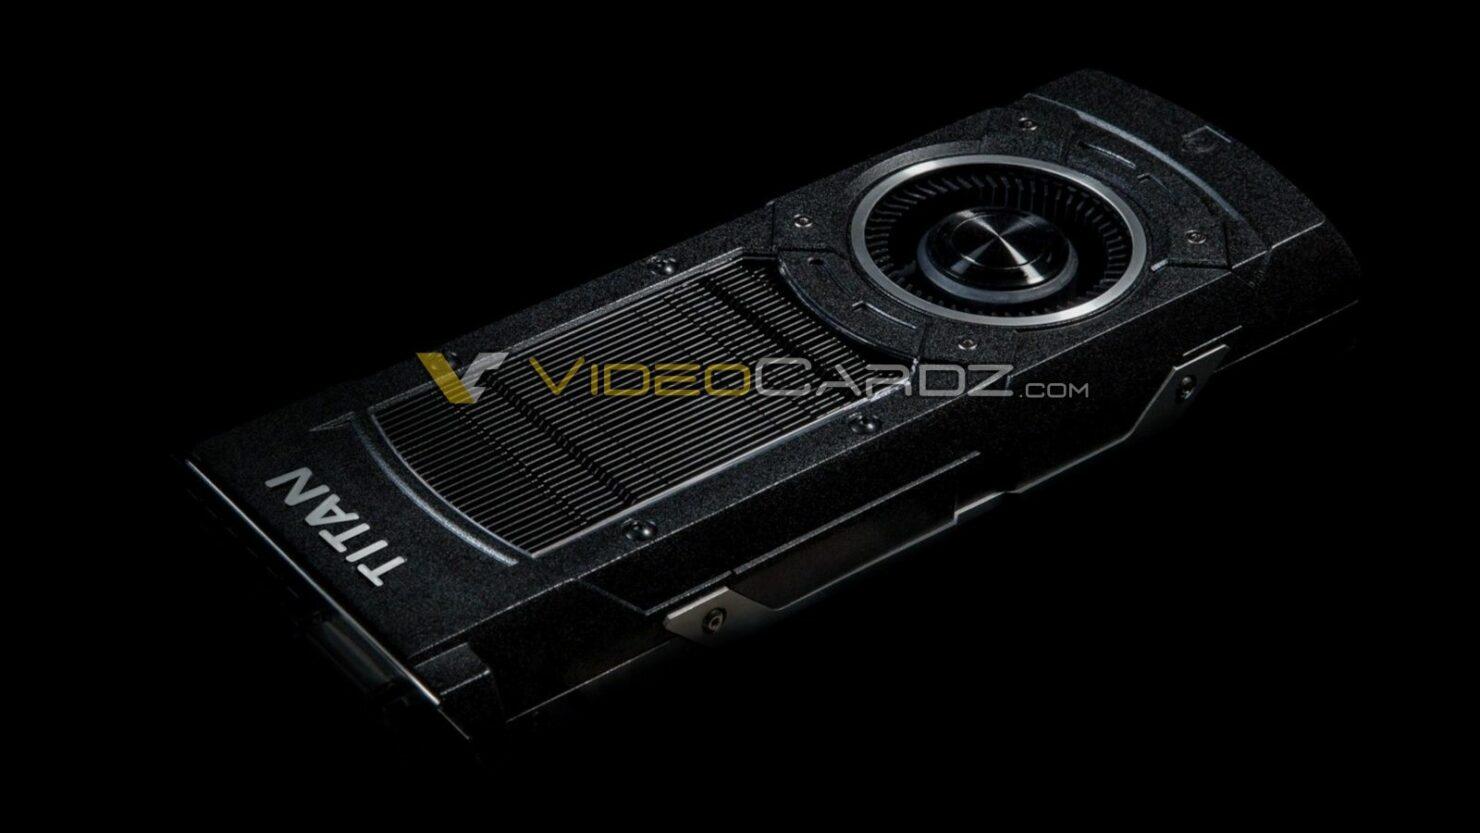 nvidia-geforce-gtx-titan-x_beauty-shots_1